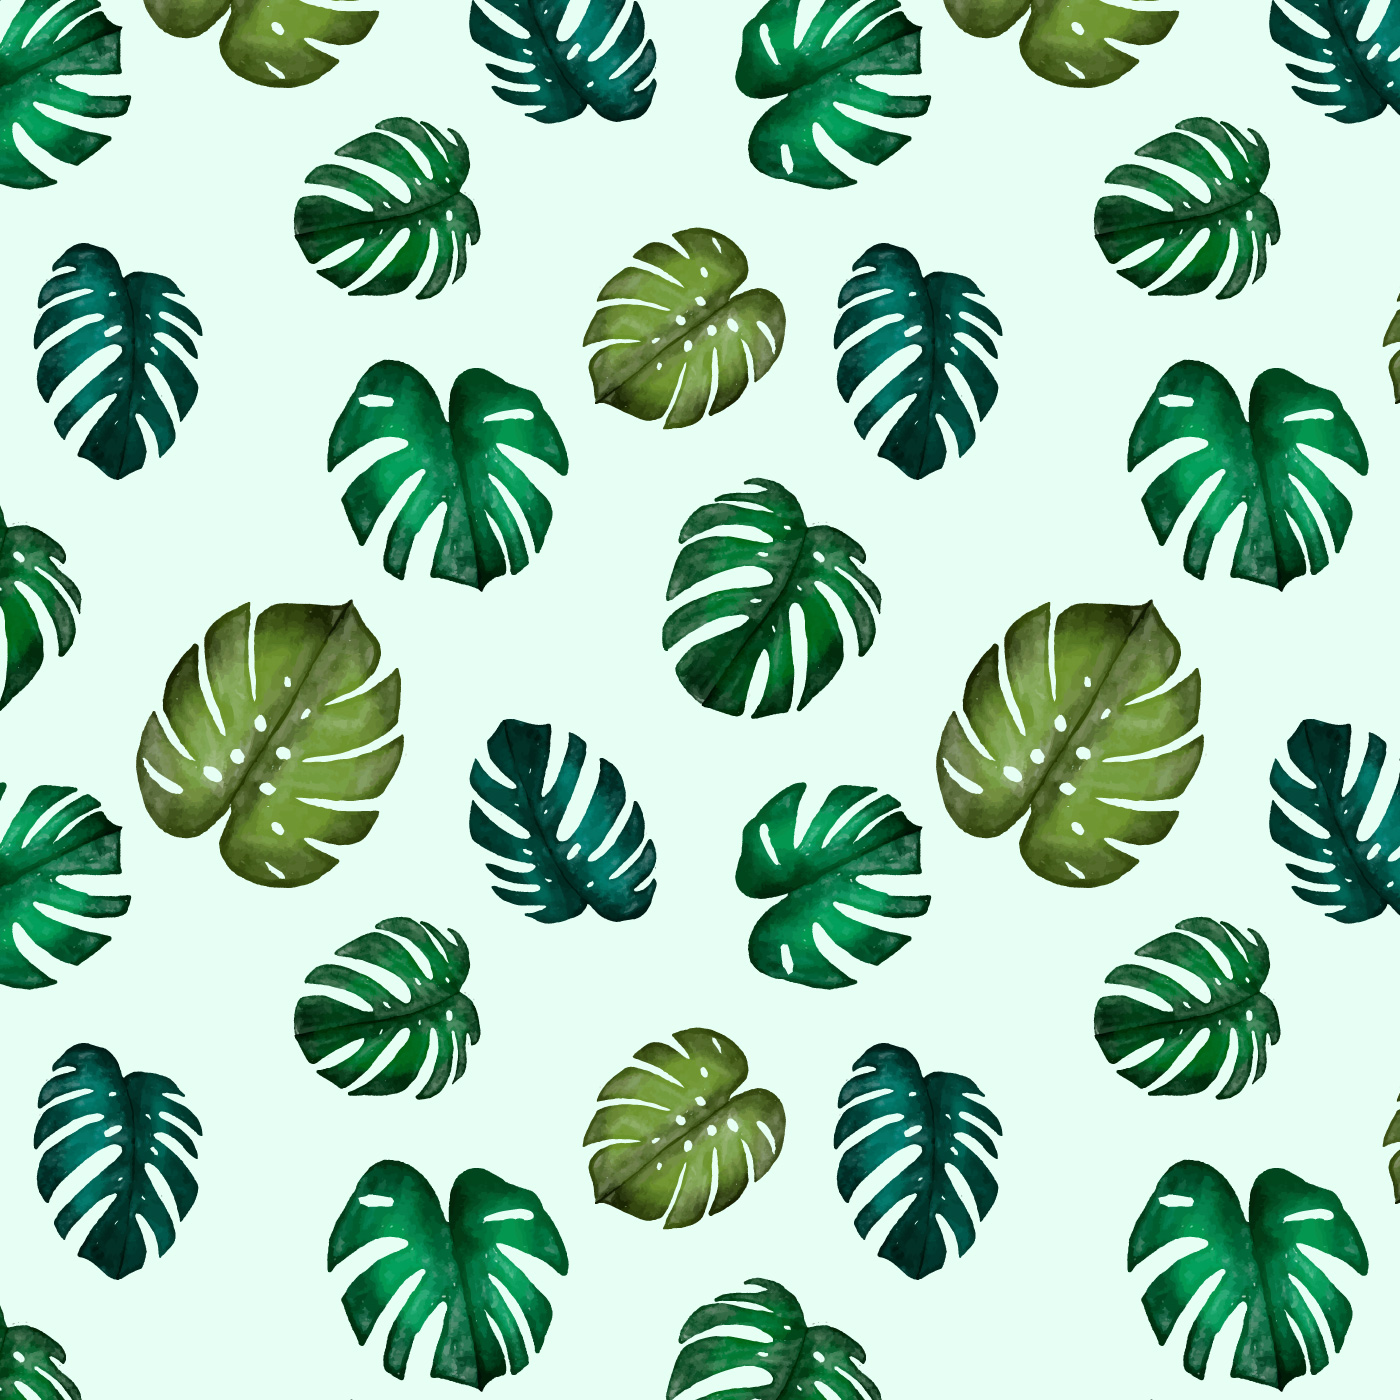 Cute Watercolor Monstera Leaves Pattern - Download Free ...